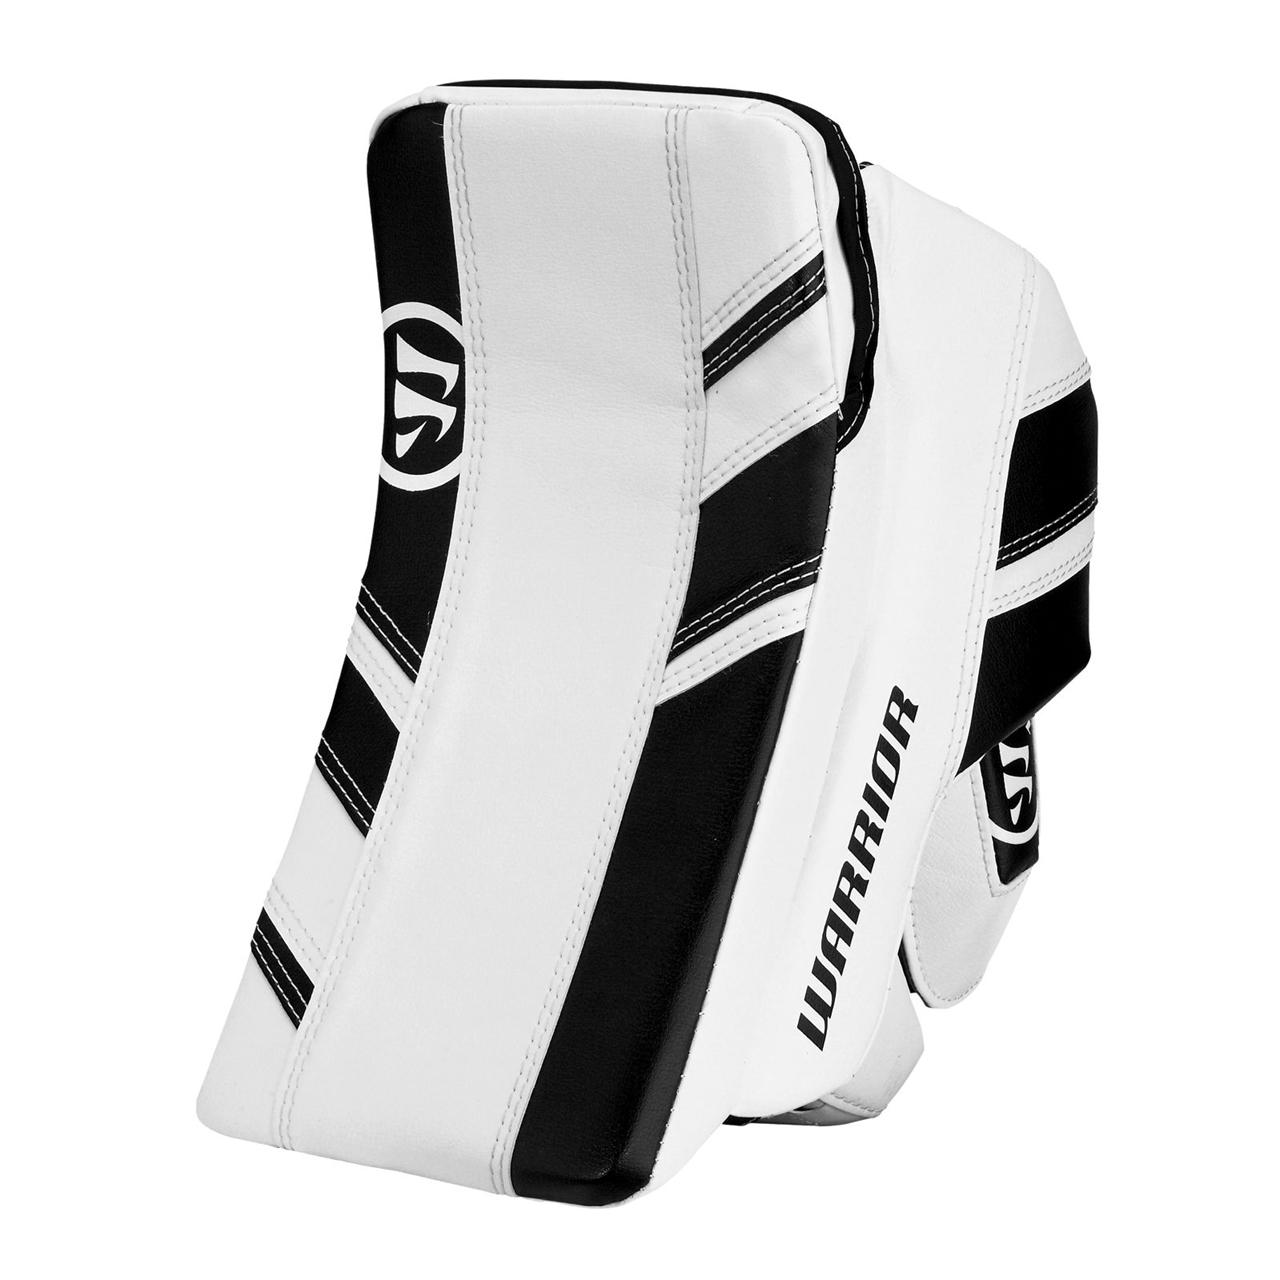 Warrior Ritual G3 Goalie Blocker Intermediate - Hockey eu